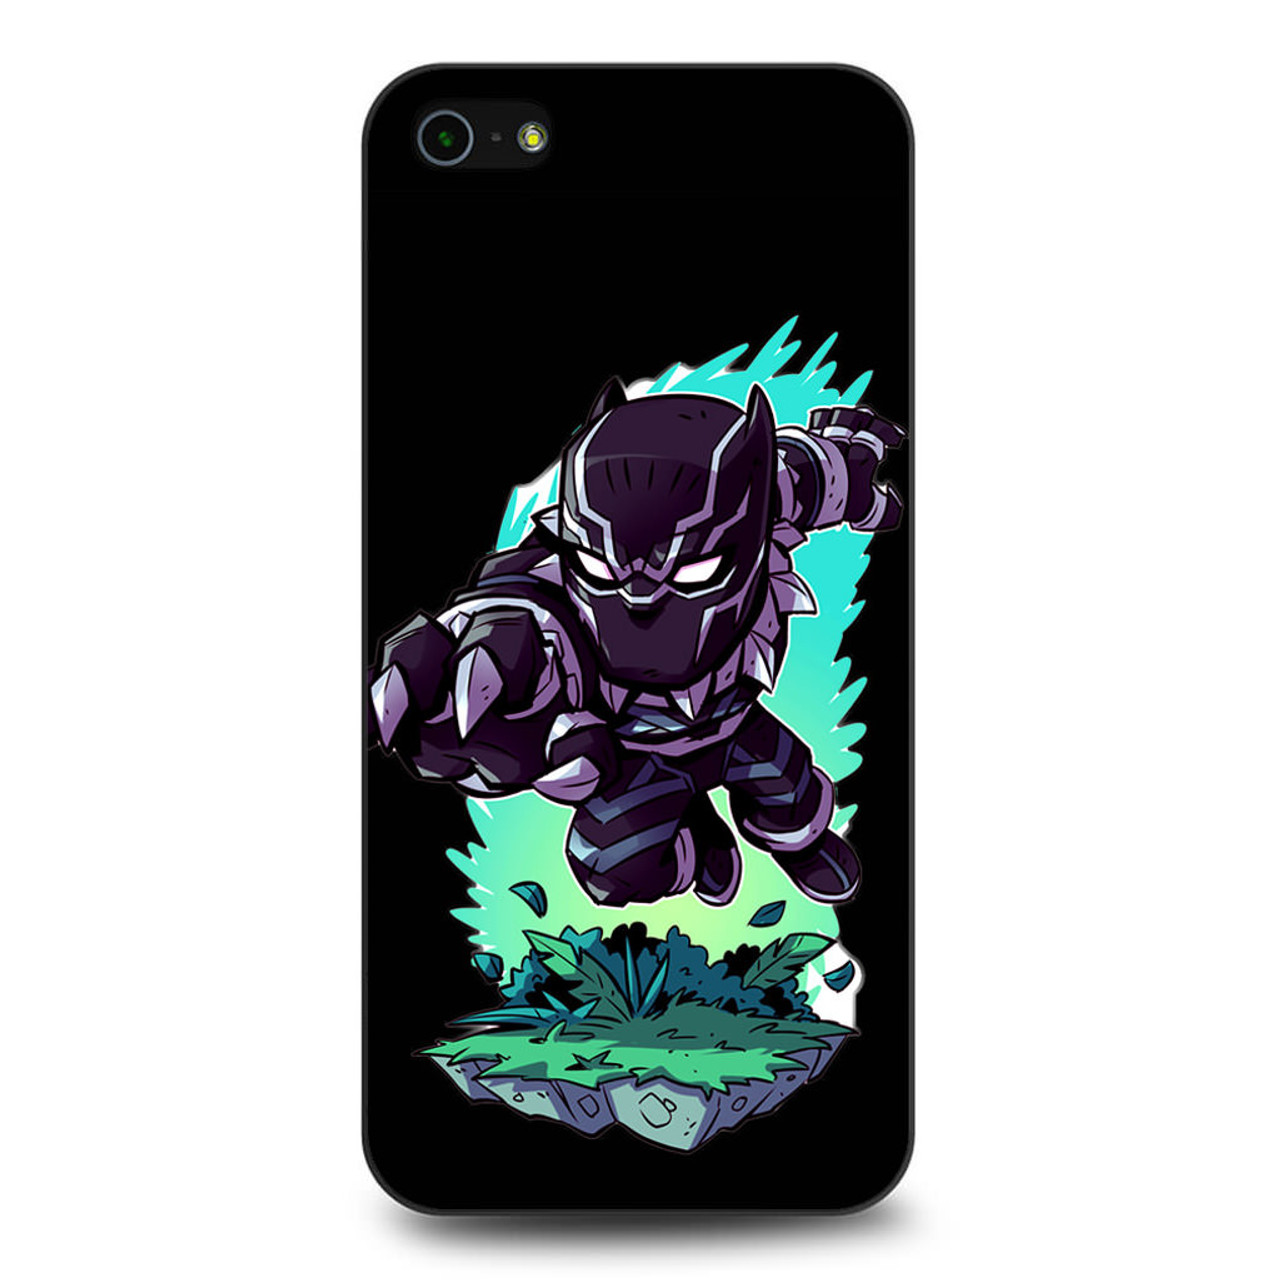 cheap for discount e02c9 77e1d Black Panther Chibi iPhone 5/5S/SE Case